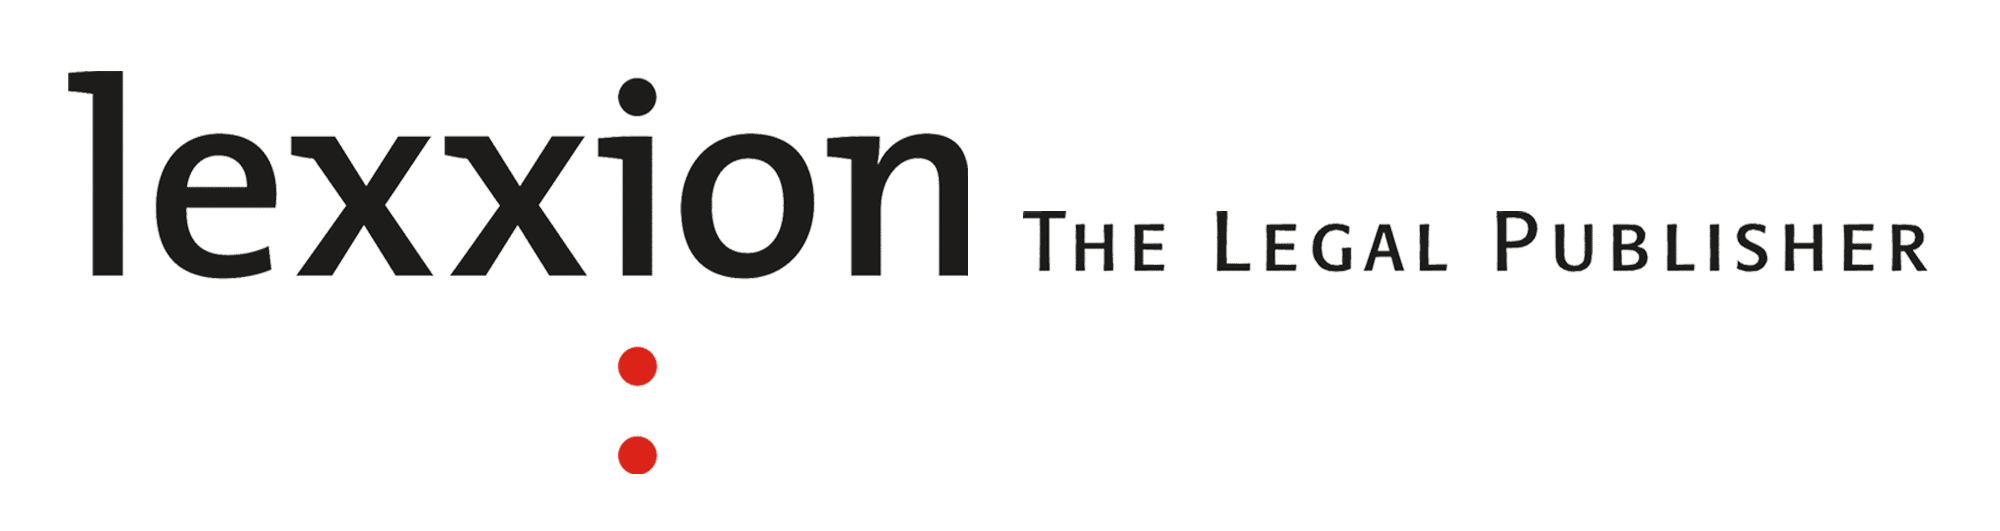 Lexxion Logo